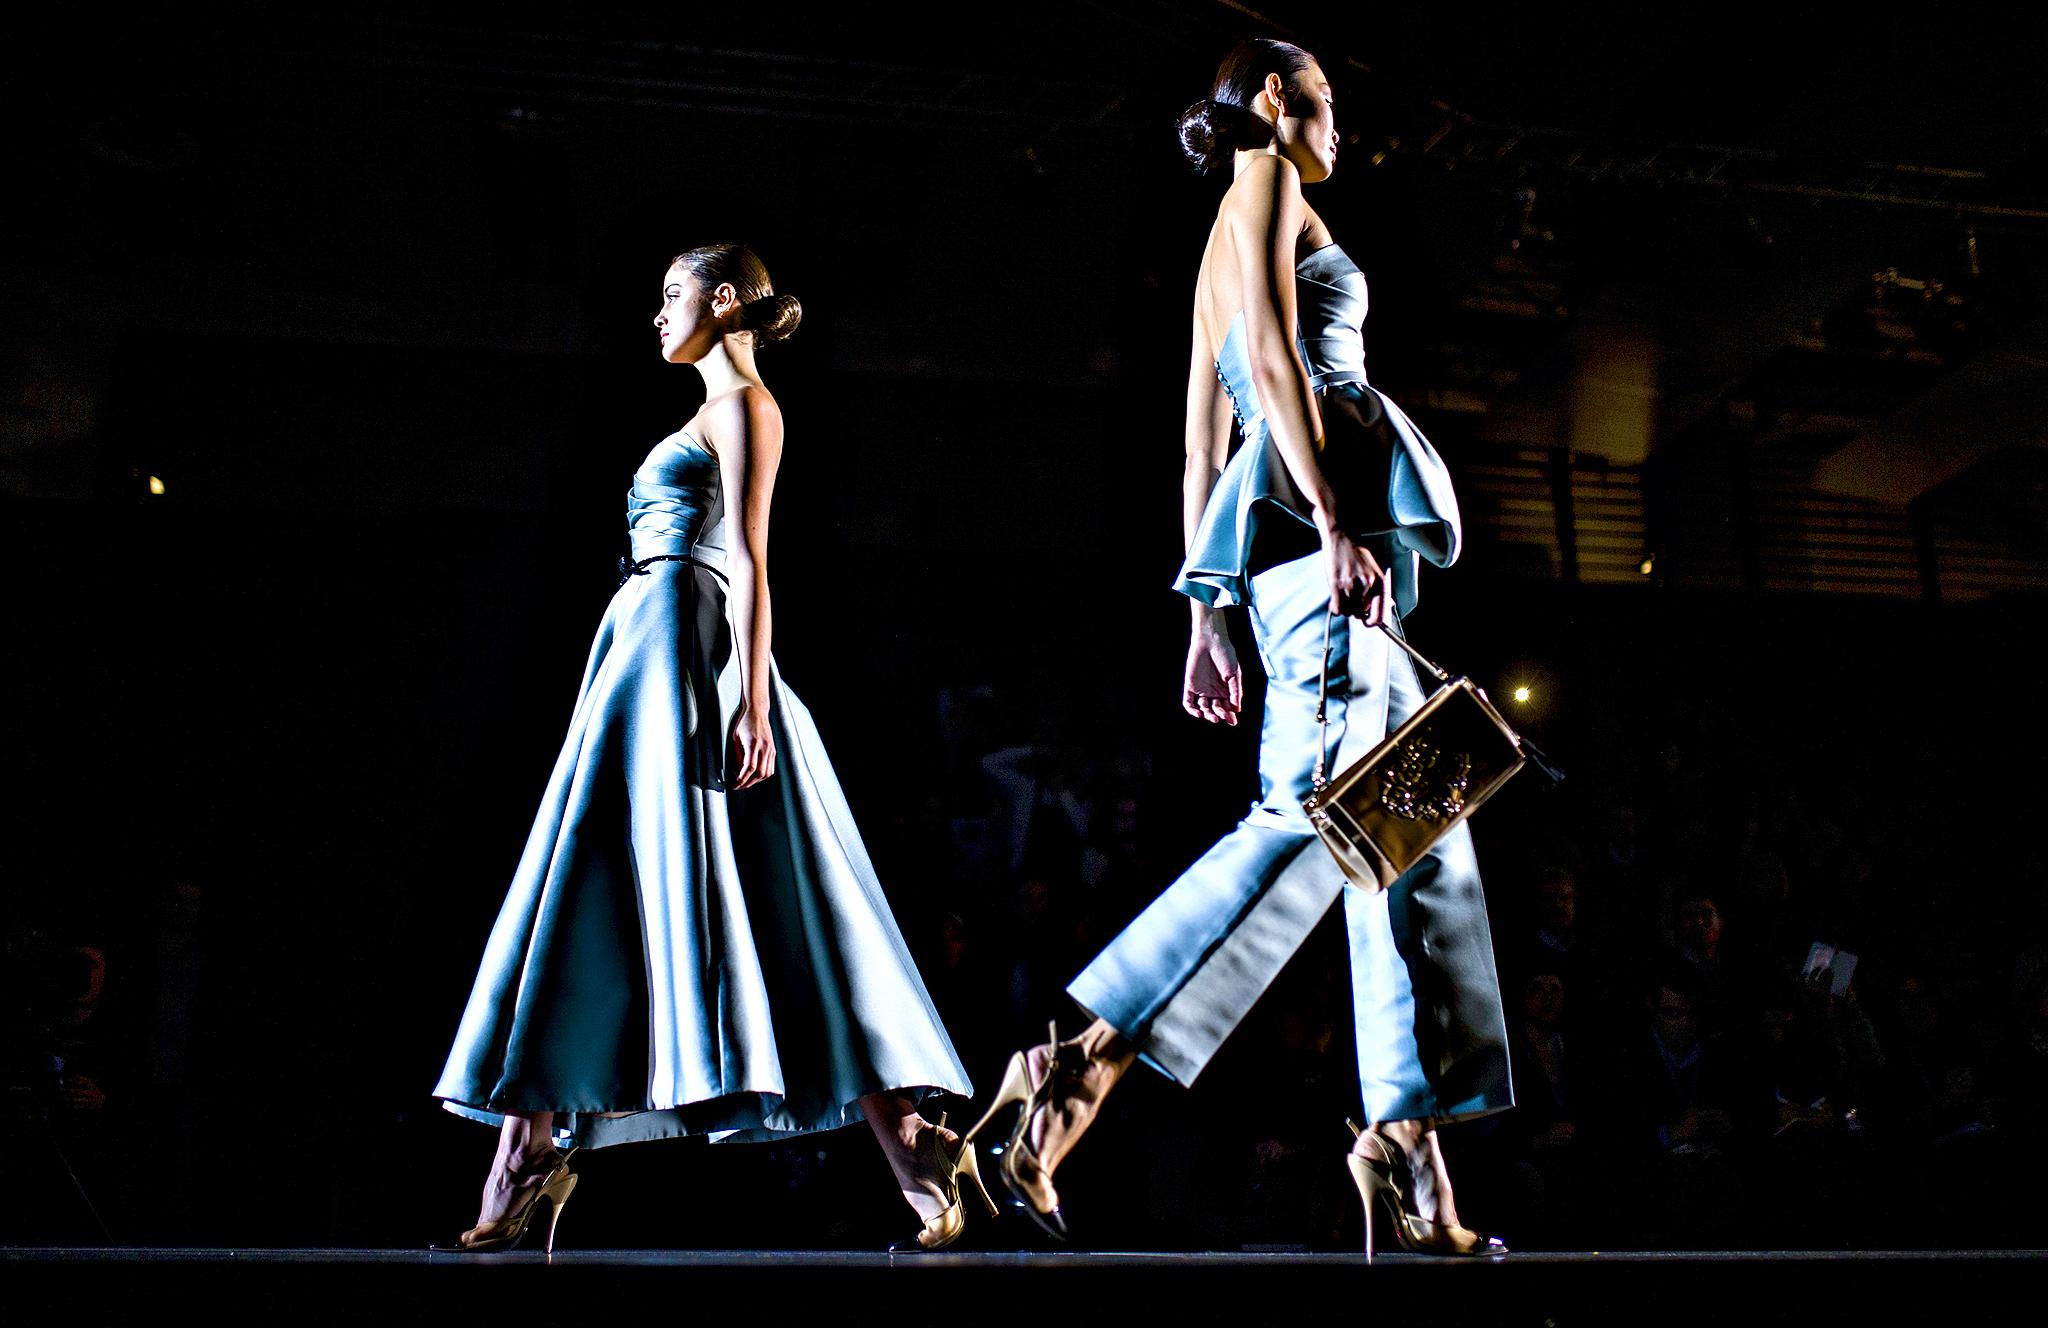 Models display Autumn/Winter designs by Hannibal Laguna during Madrid's Fashion Week, in Madrid, Spain, Monday, Feb. 17, 2014.